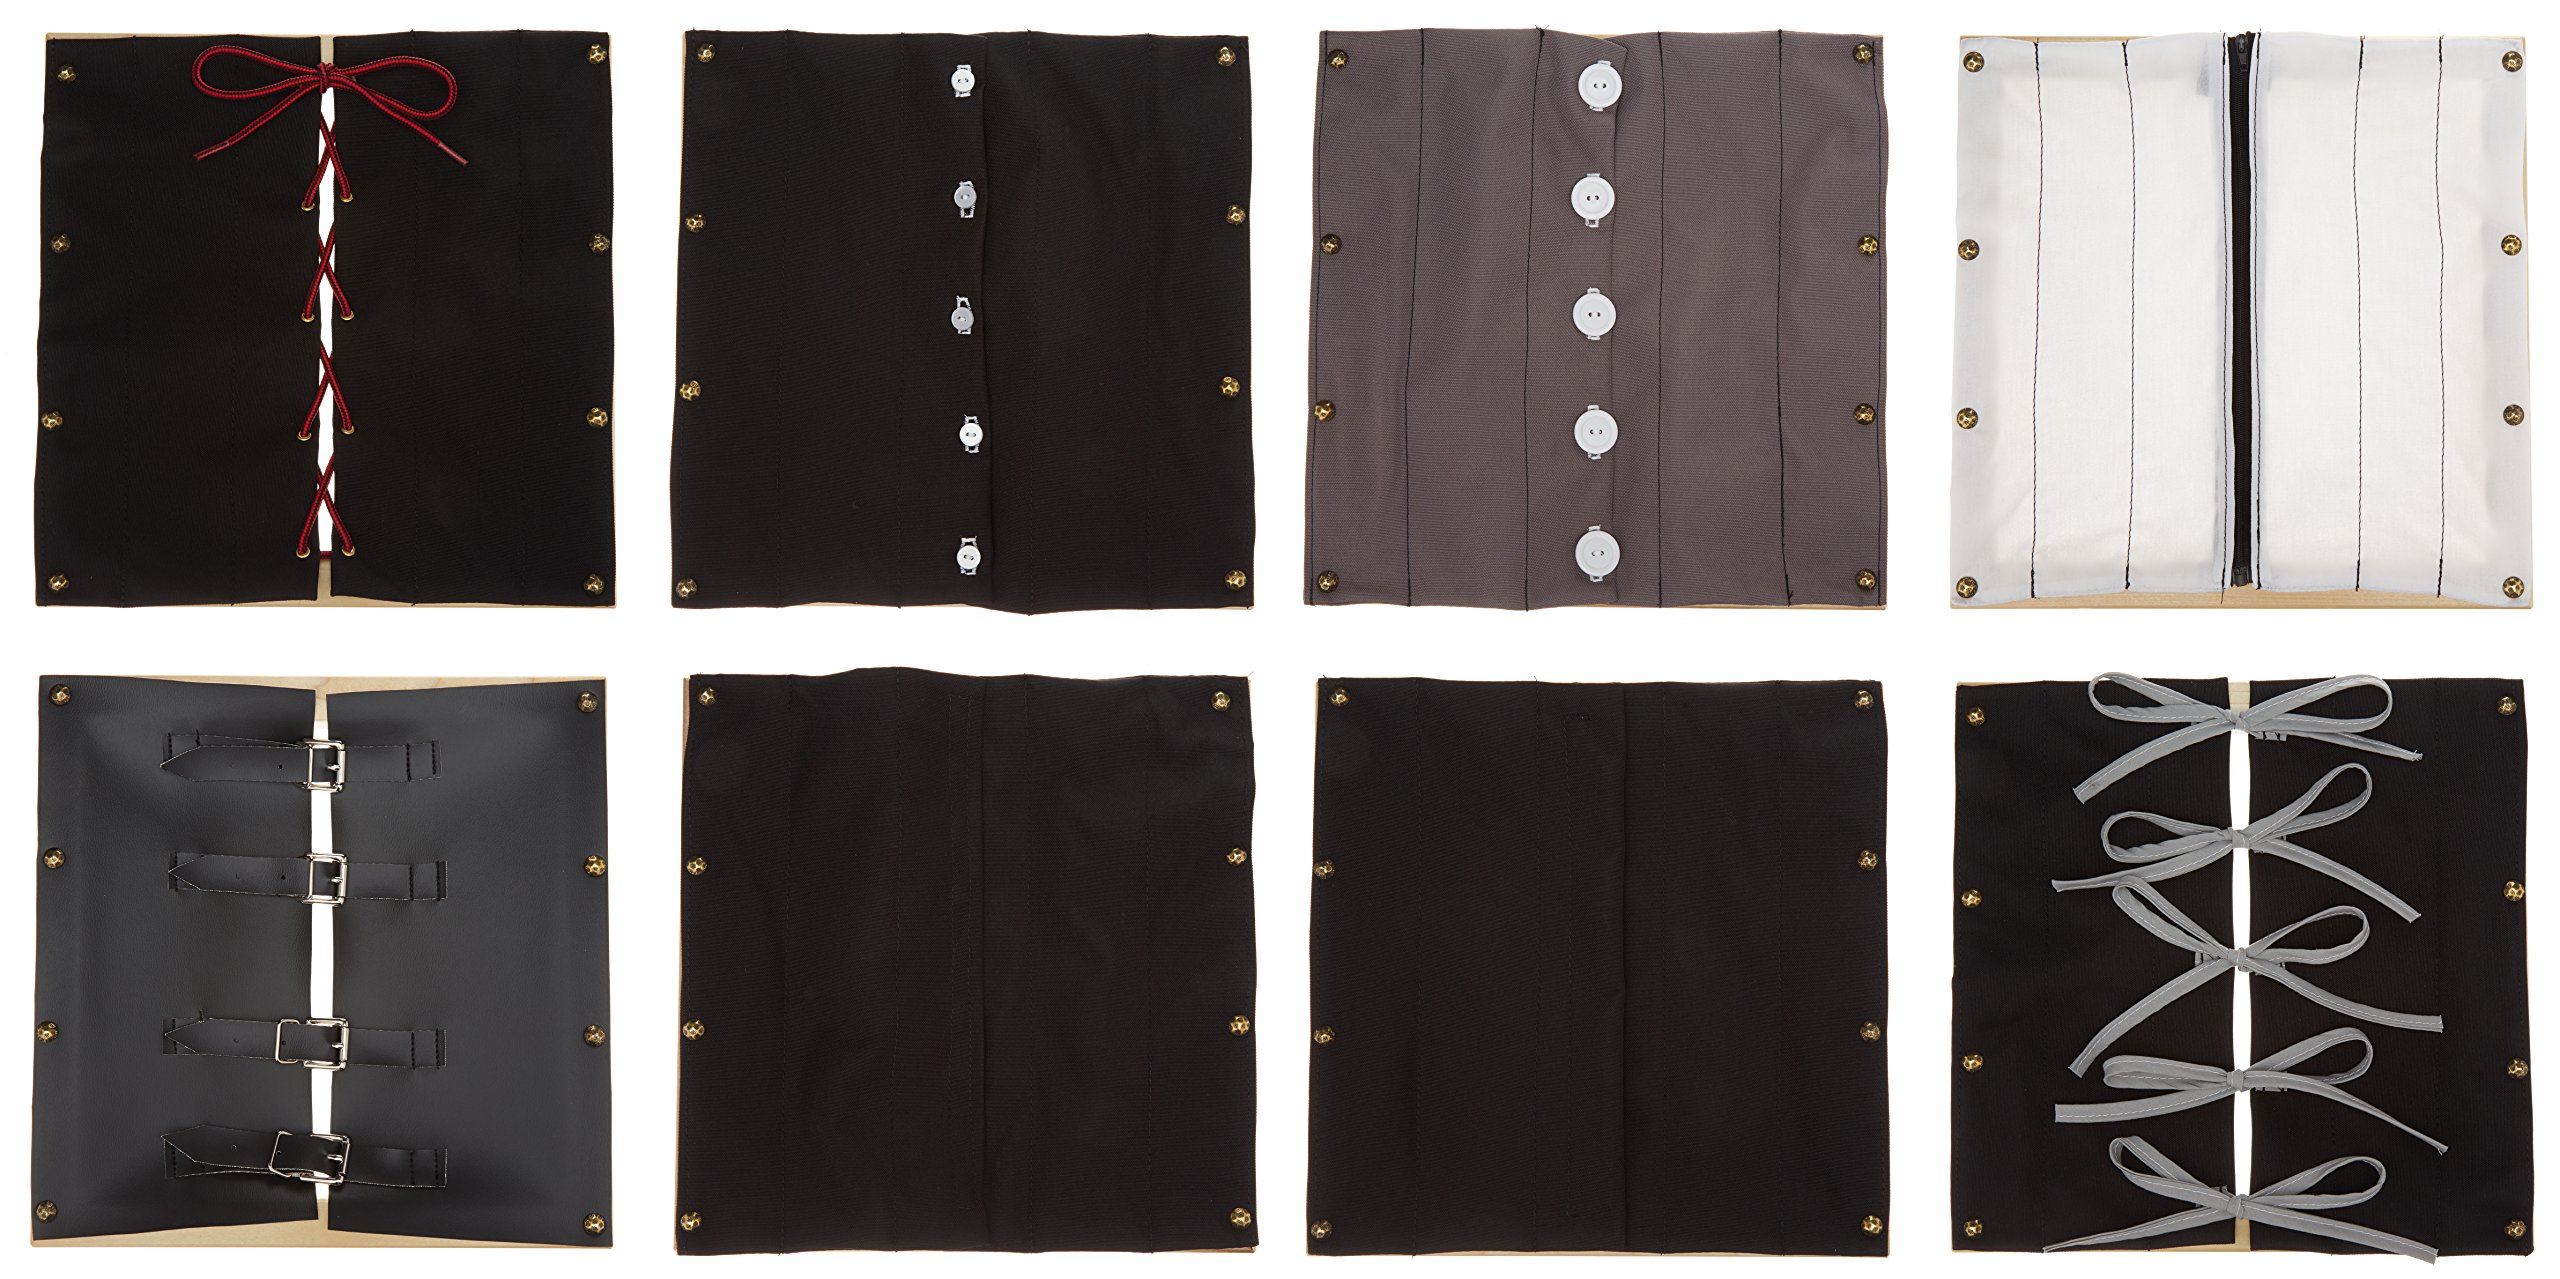 Sammons Preston Dressing Frame Sets, Parts 1 & 2, Eight 12'' Cloth Squares Seated on Wood Frames, Motor Skill Training Aid